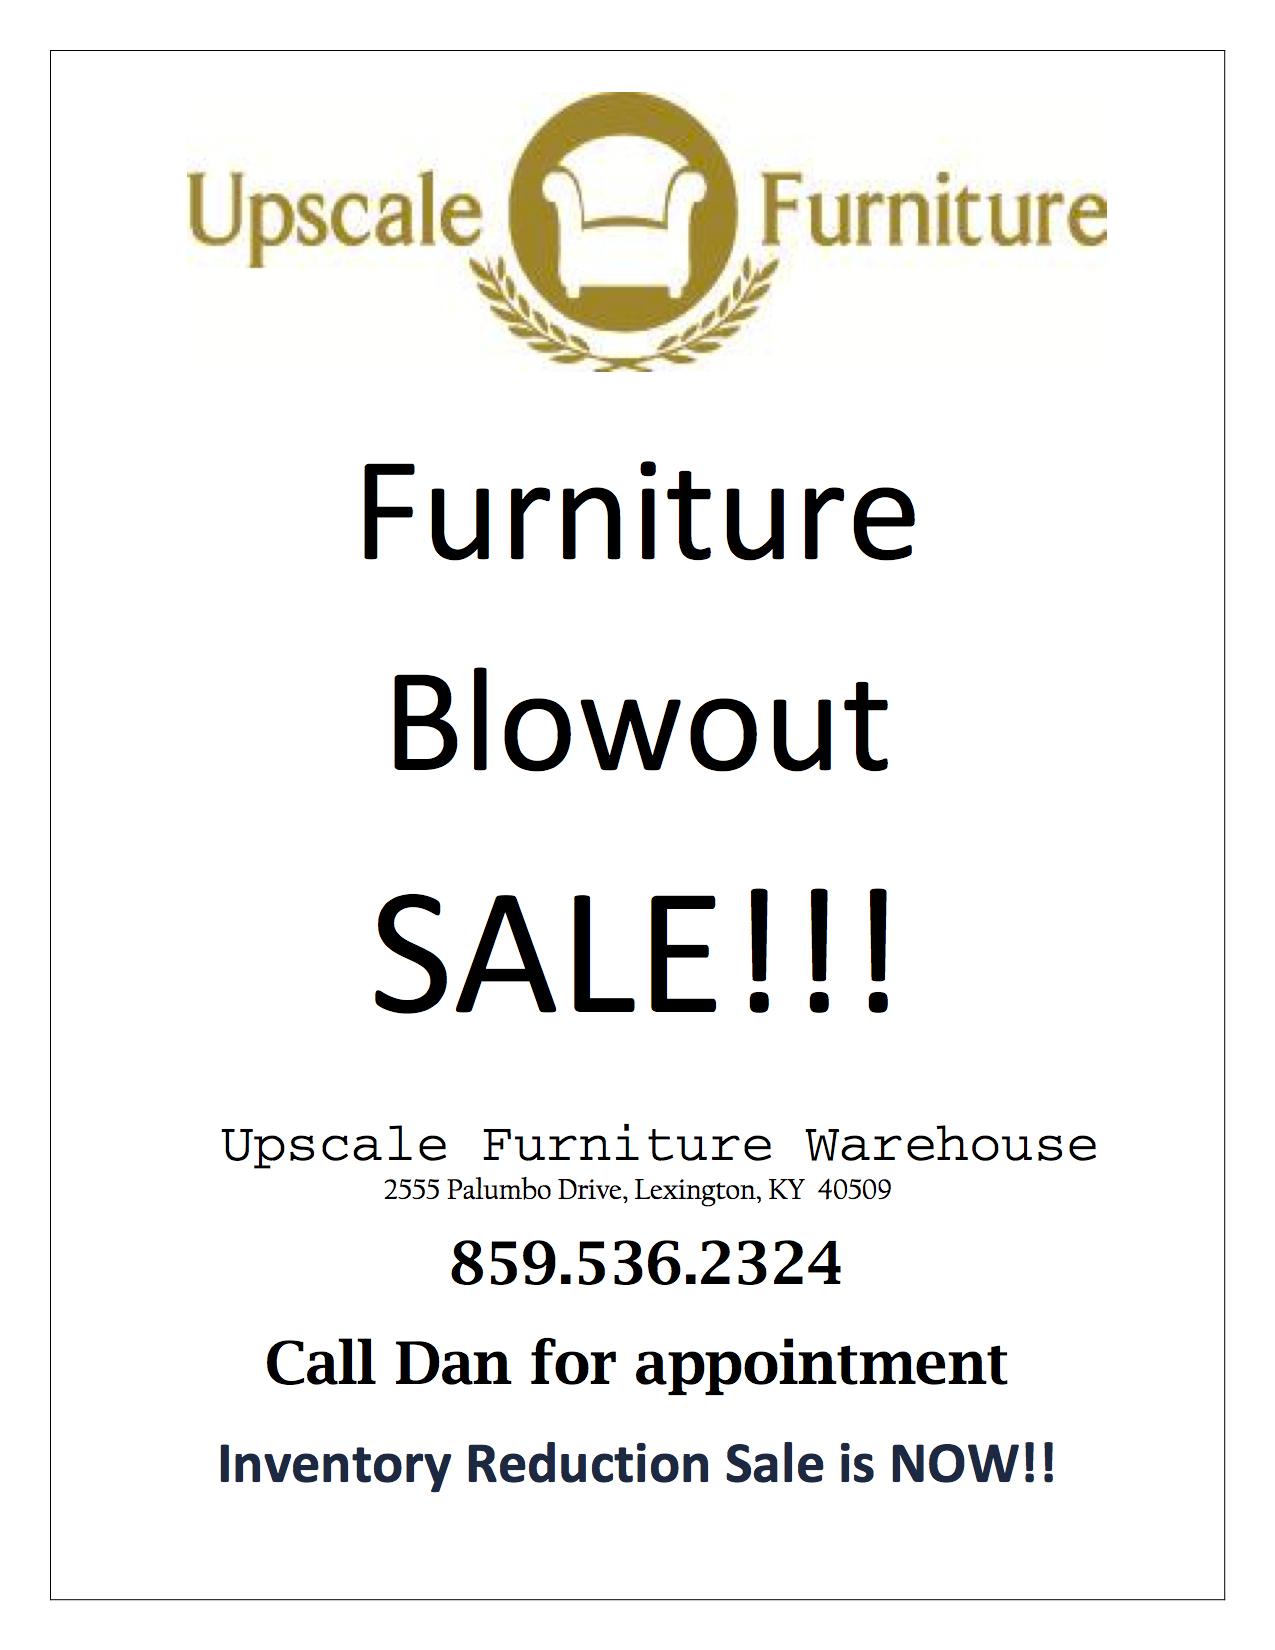 Upscale Furniture S Home Furniture Blowout Sale Starts Now Upscale Furniture Lexington